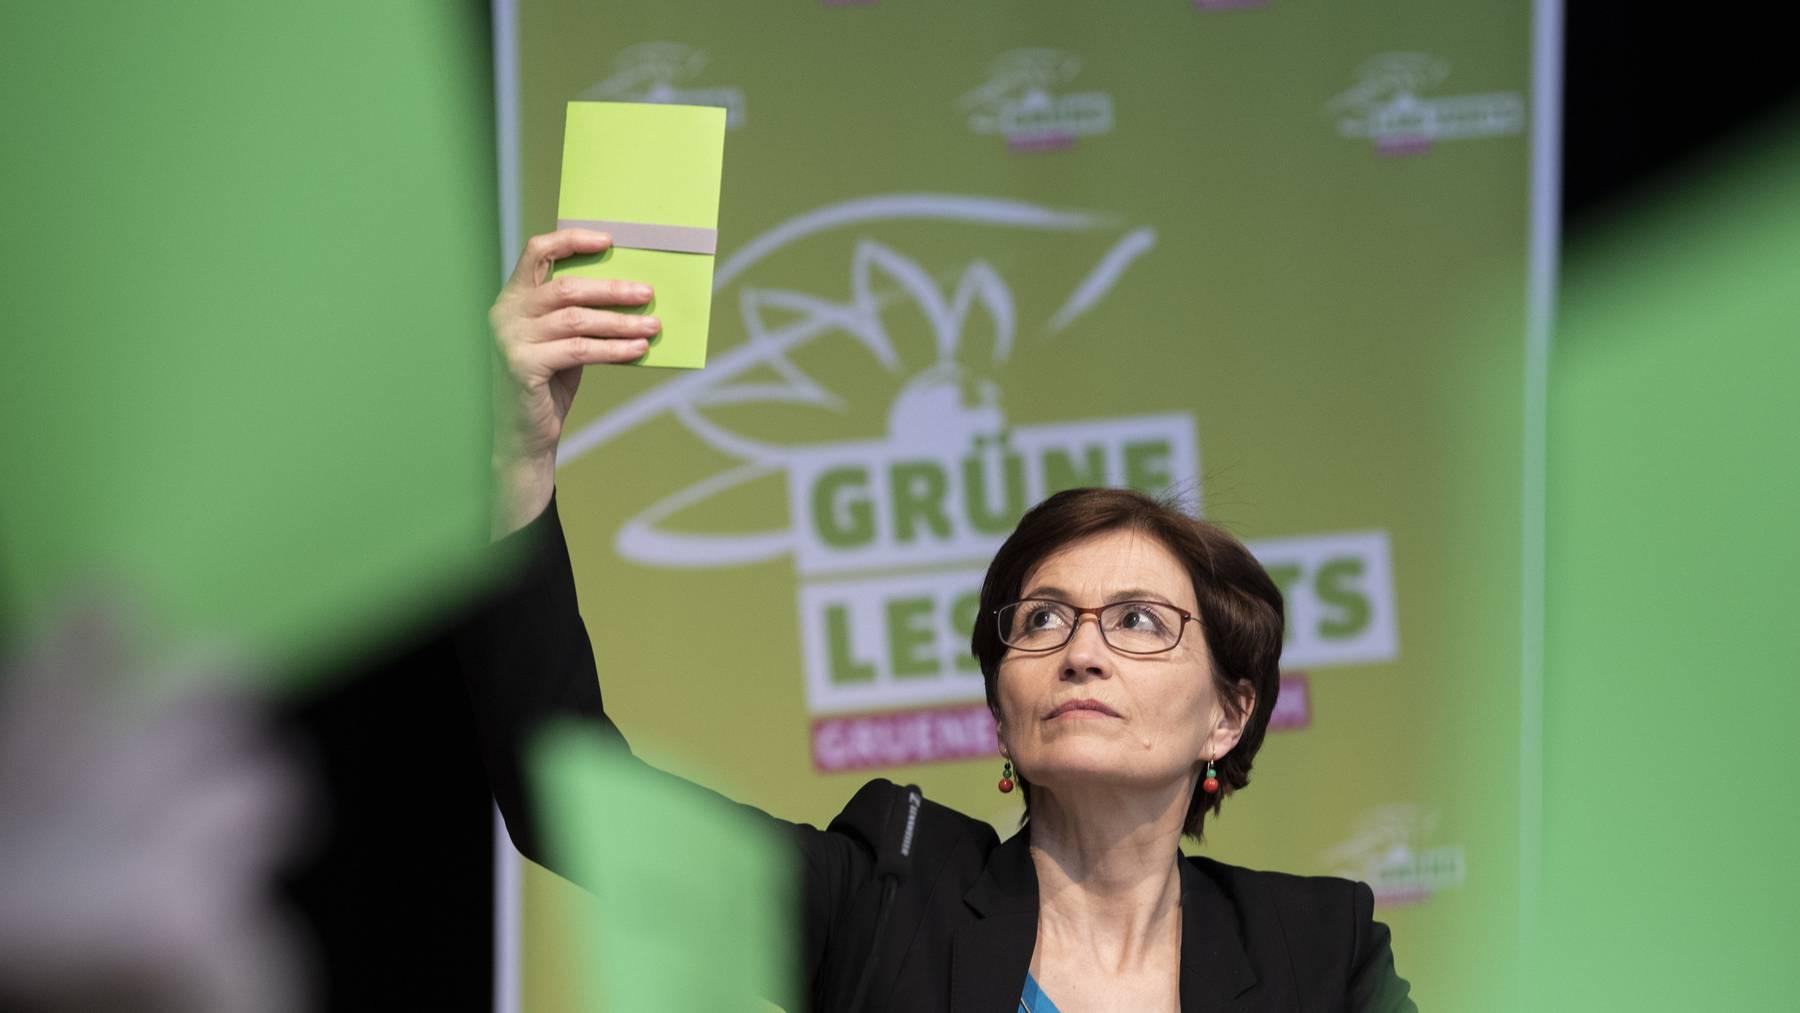 Grünen-Präsidentin Regula Rytz an der Delegiertenversammlung in Frauenfeld.